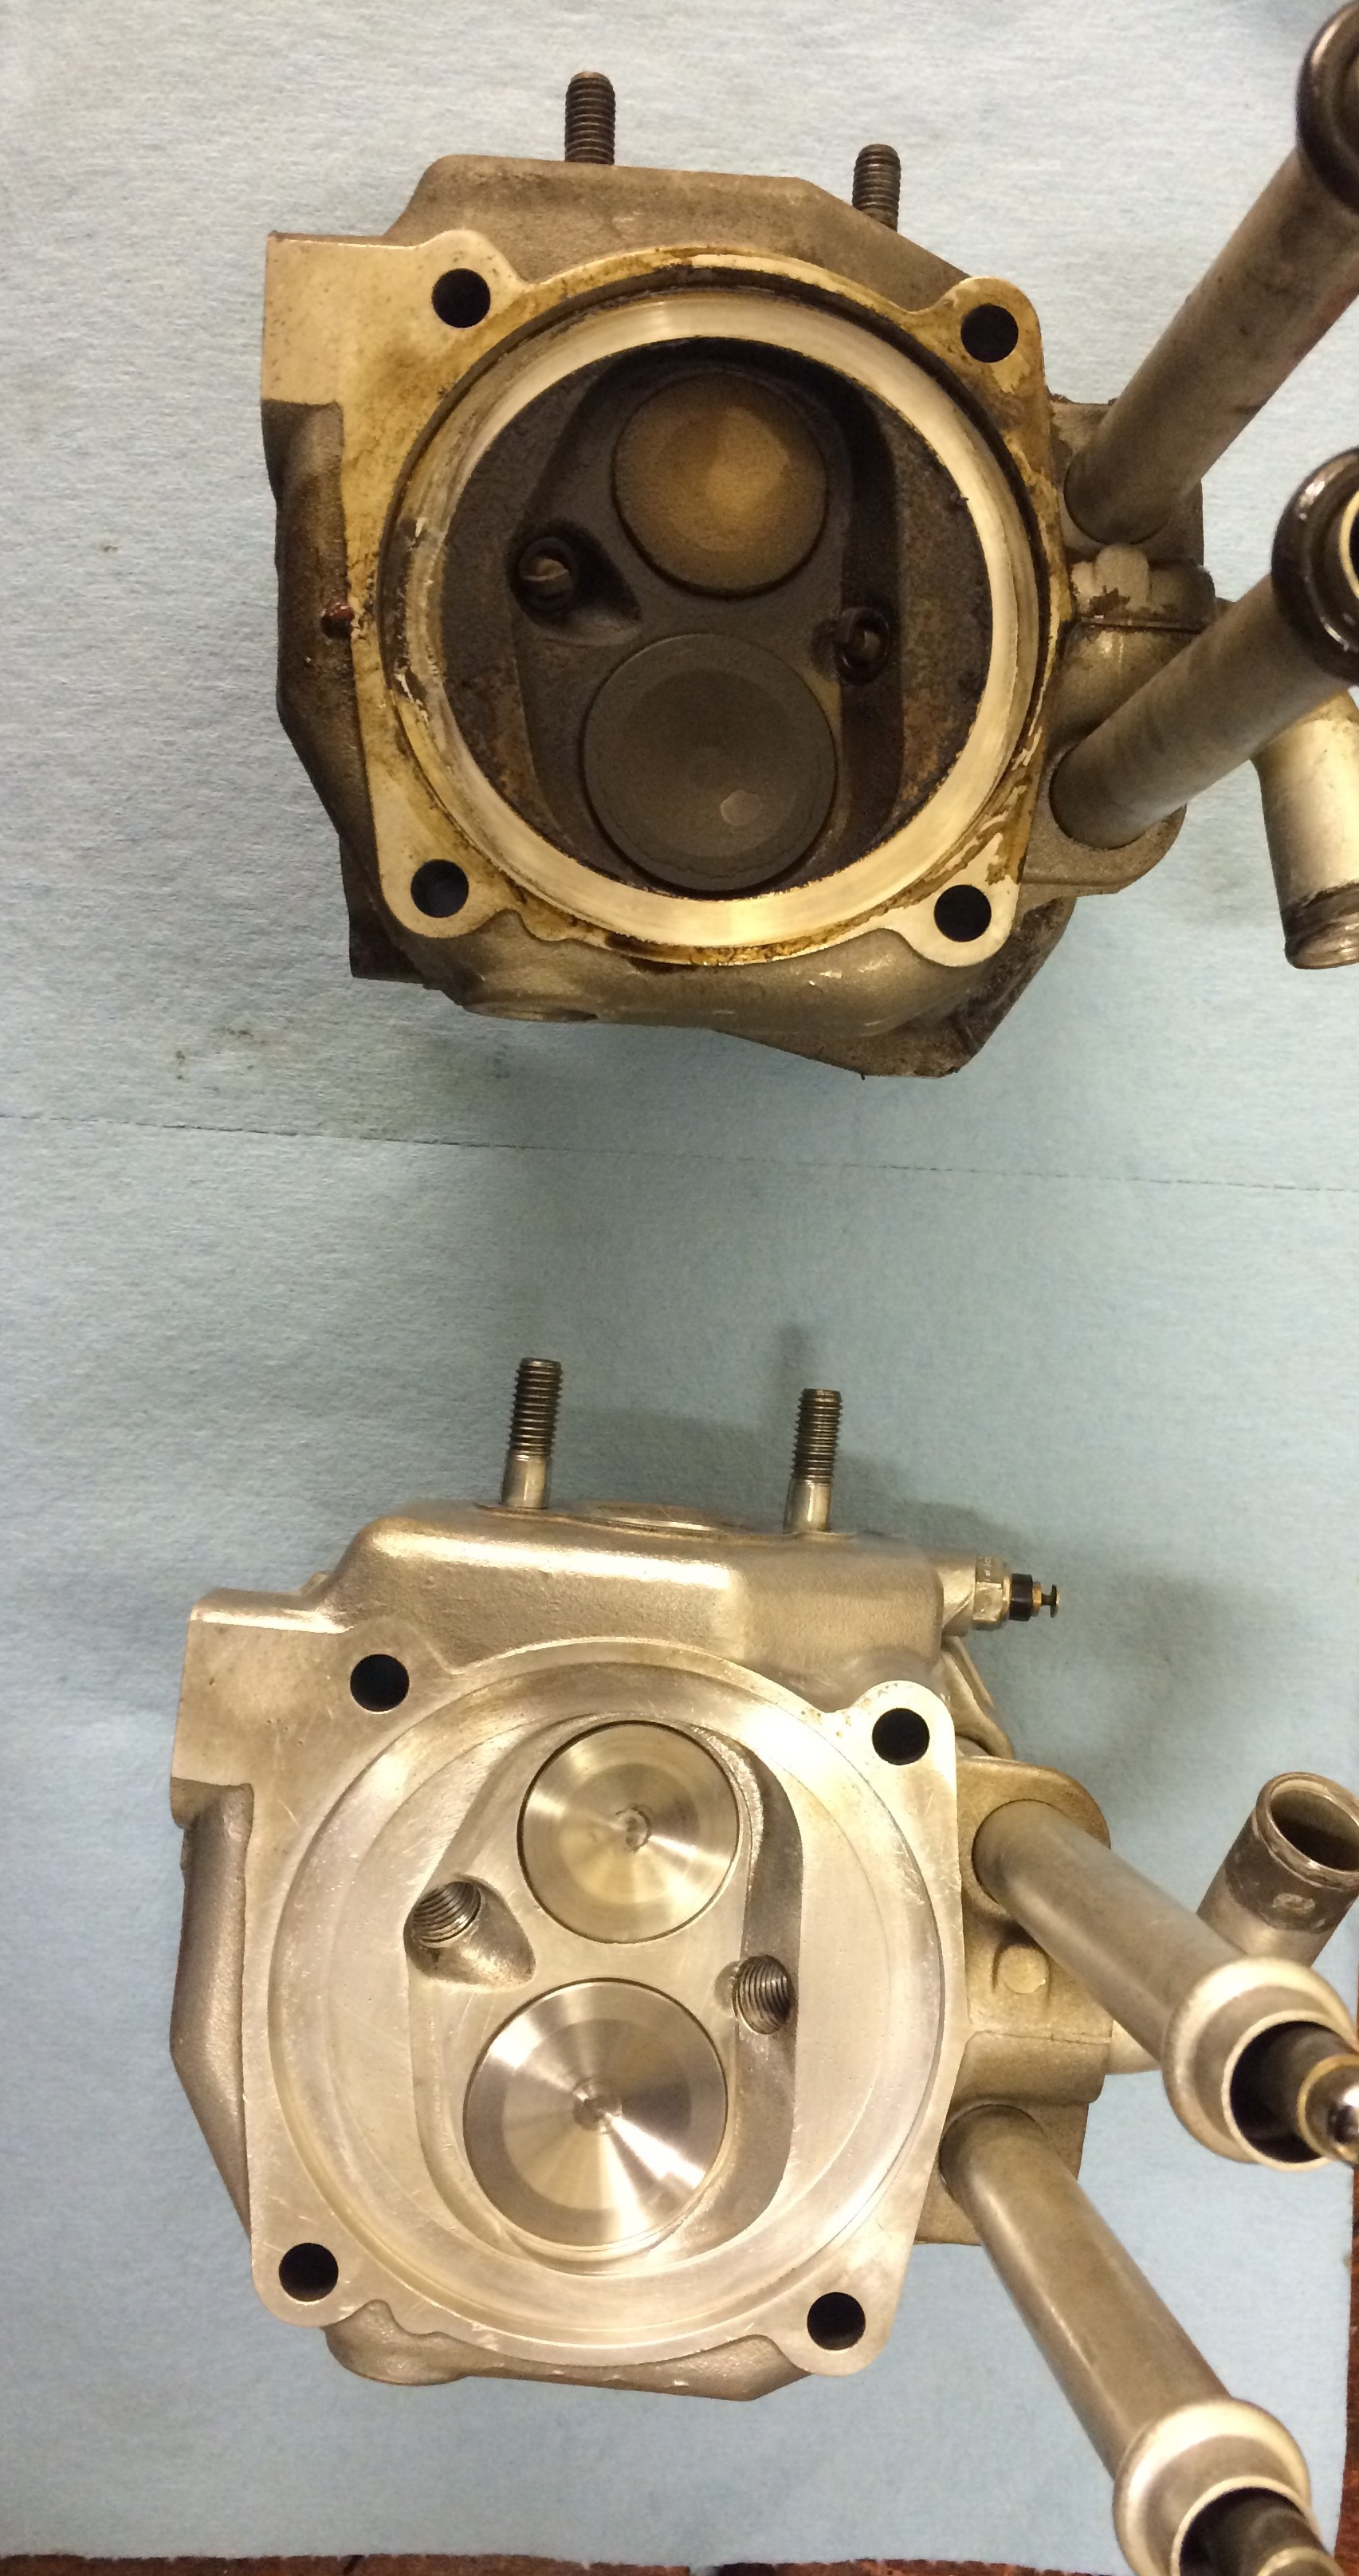 Eccleston Aviation - Rotax 912 series engine servicing